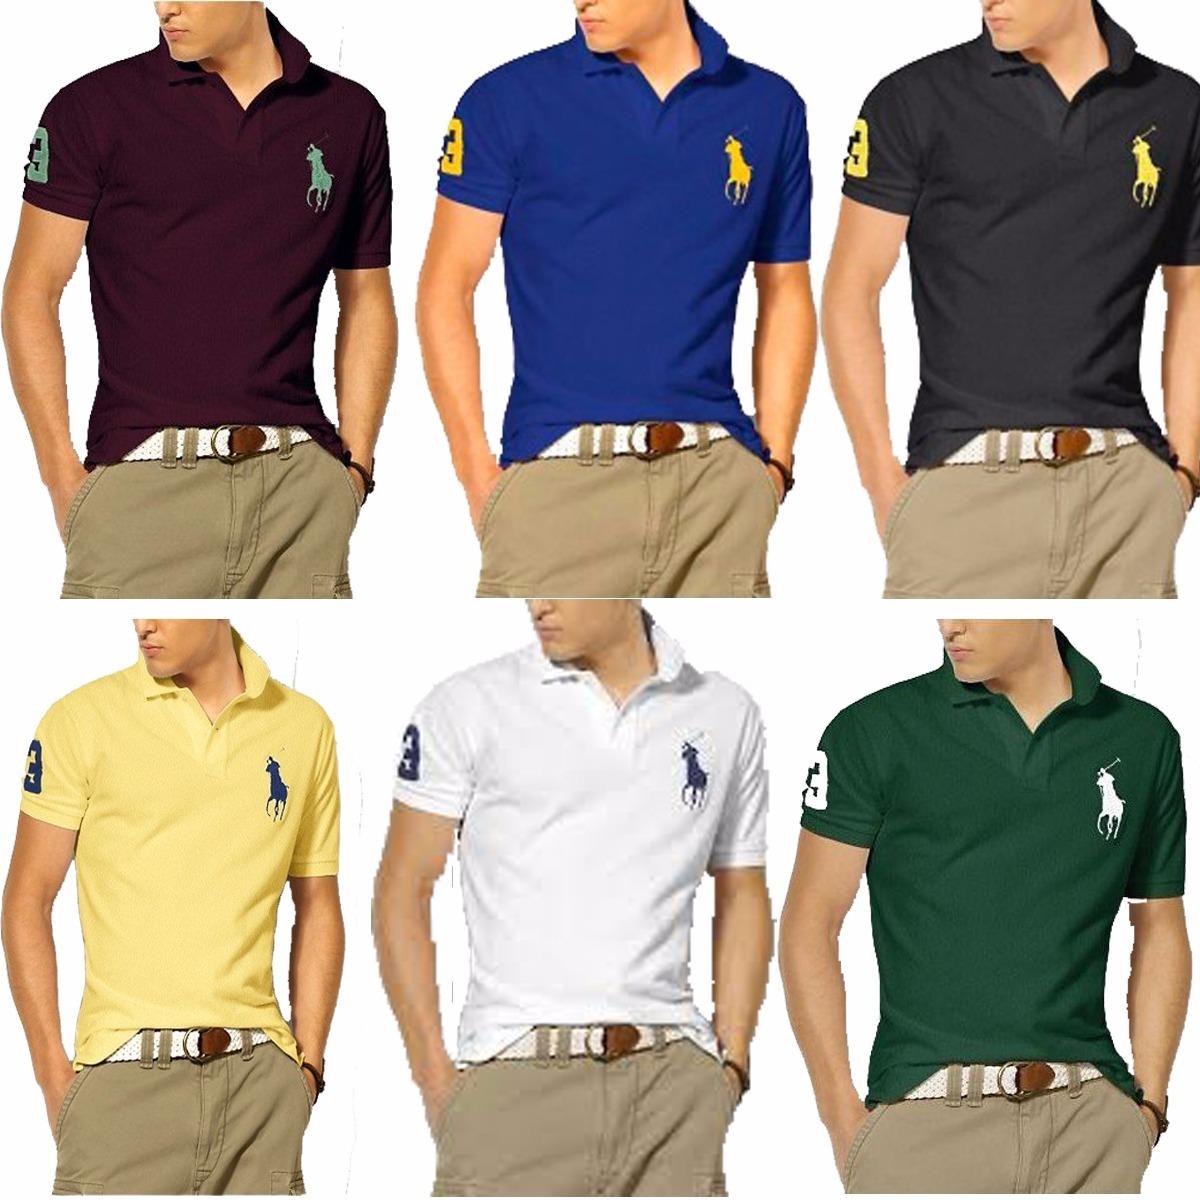 kit 04 camisas camisetas revenda gola polo masculina atacado. Carregando  zoom. 4d474494f6f9c